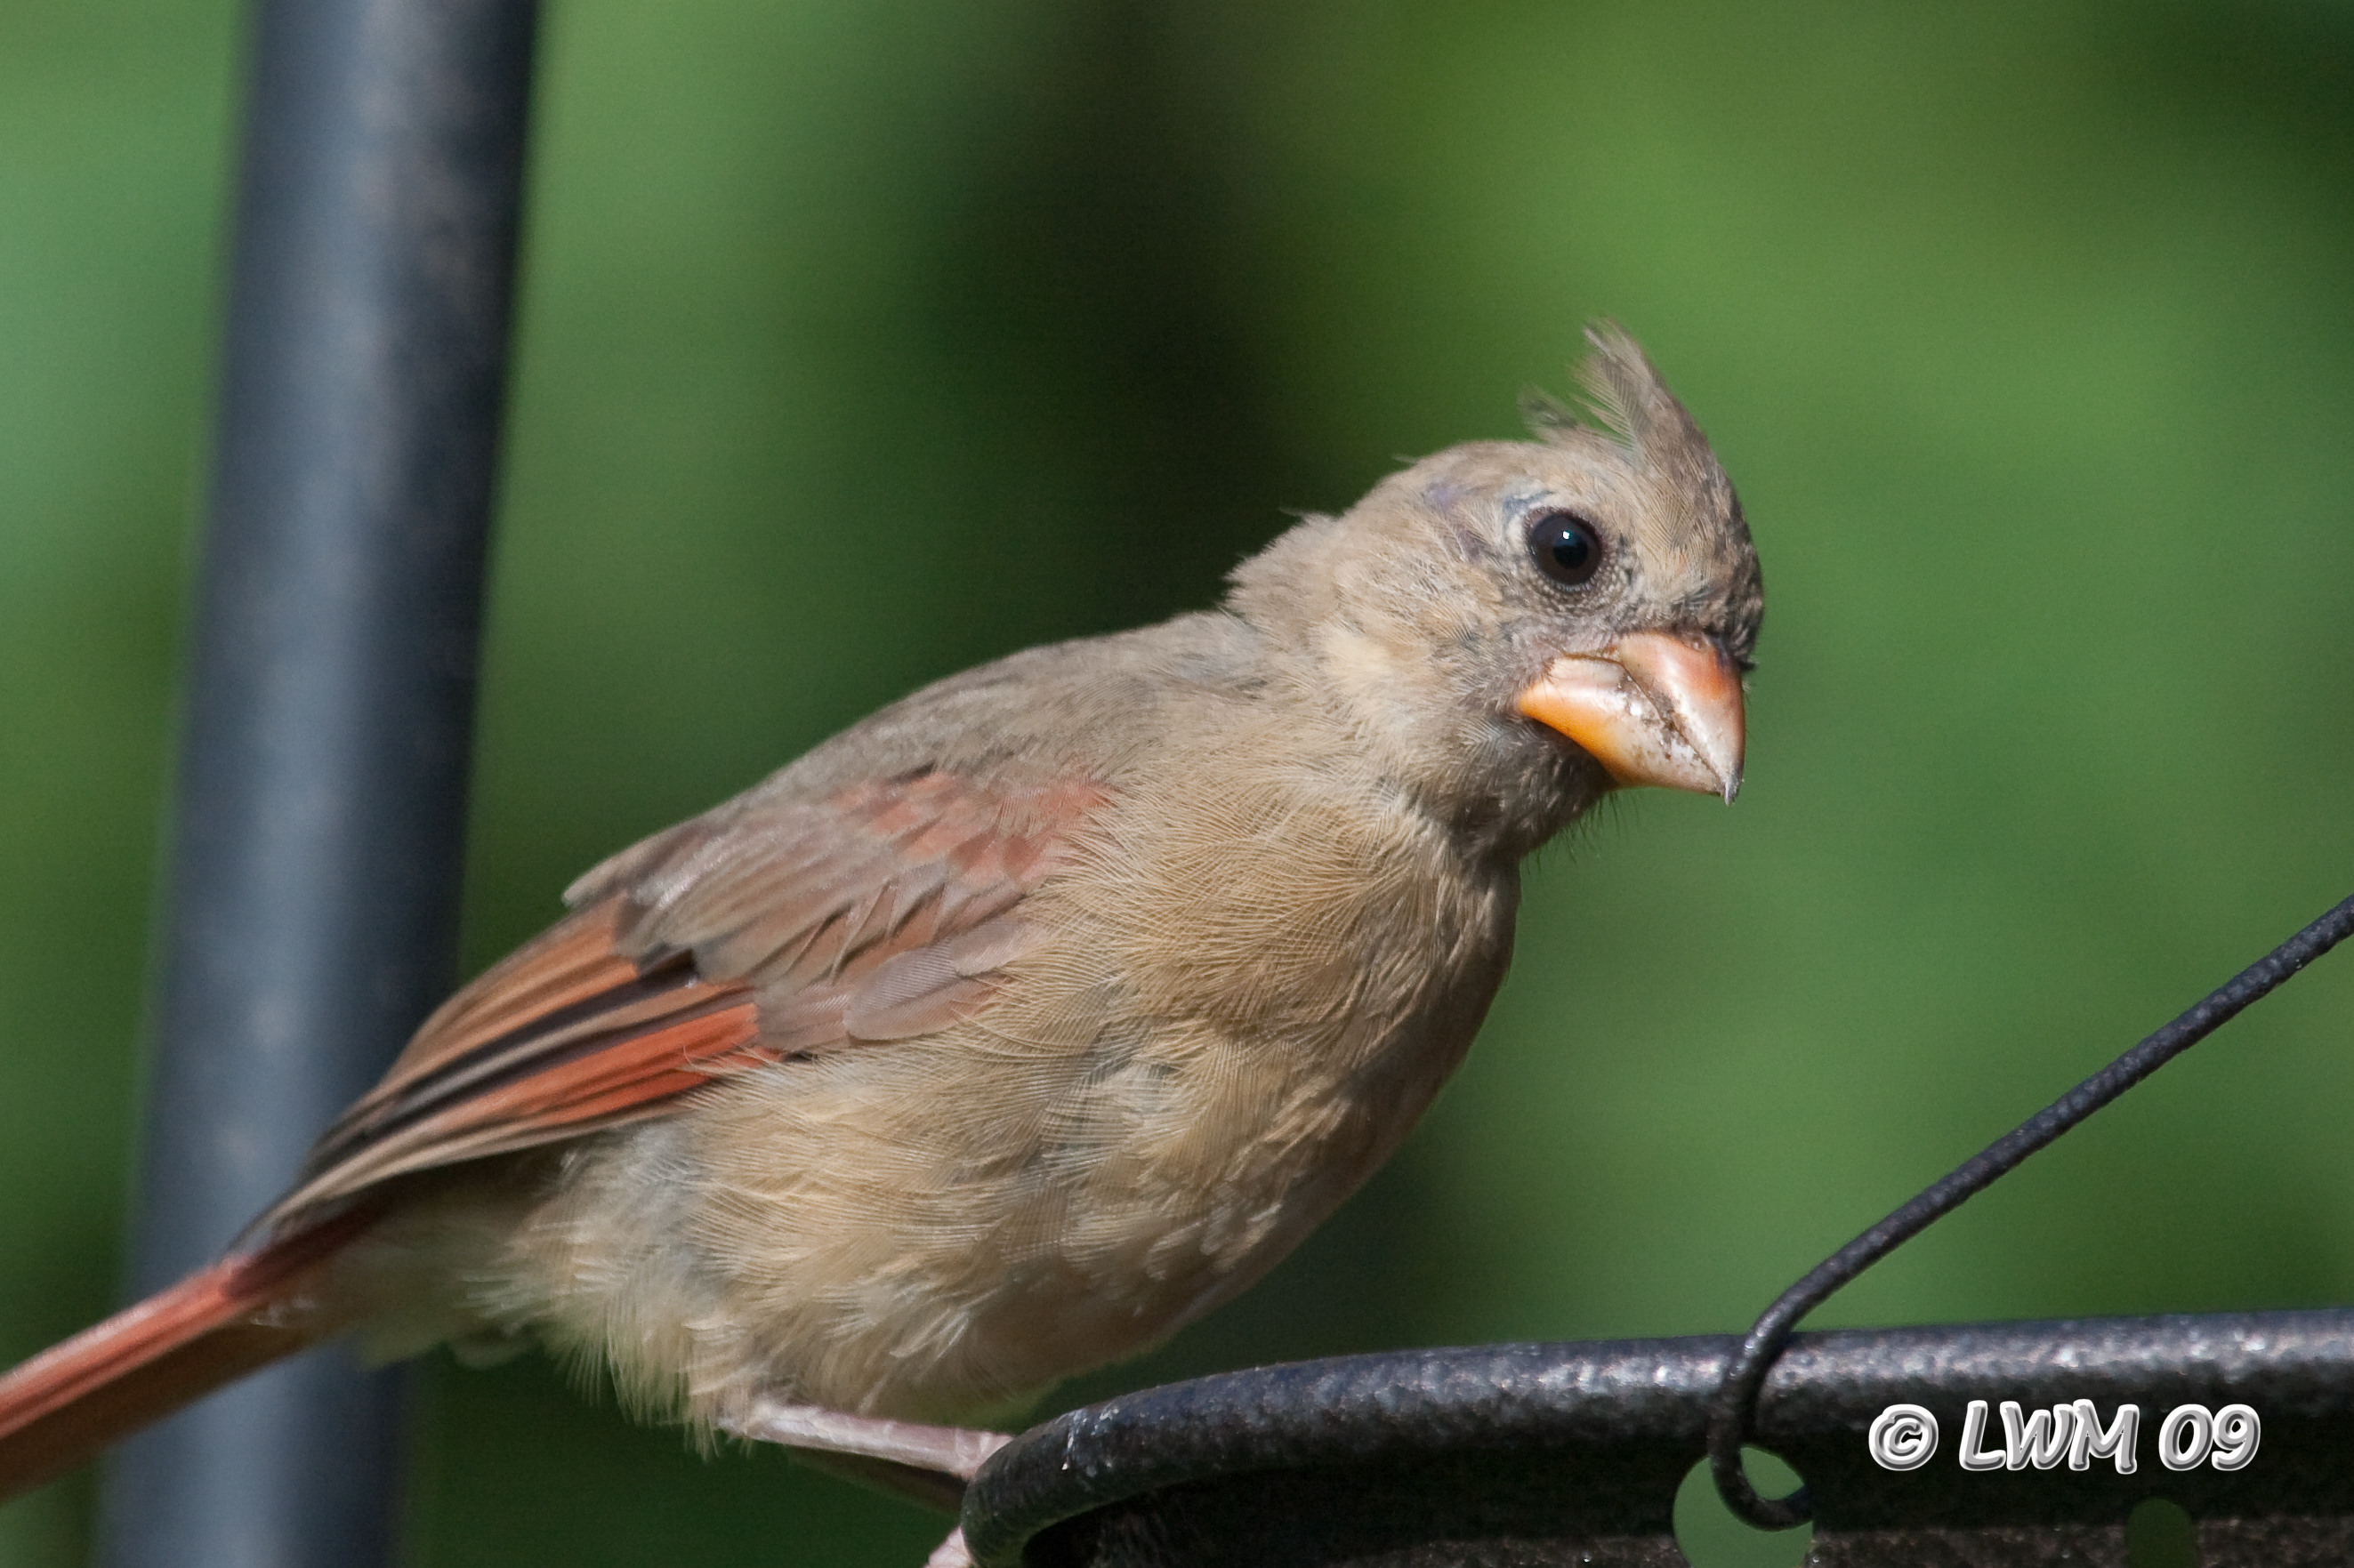 Amazoncom  BEST WINDOW BIRD FEEDER with Strong Suction